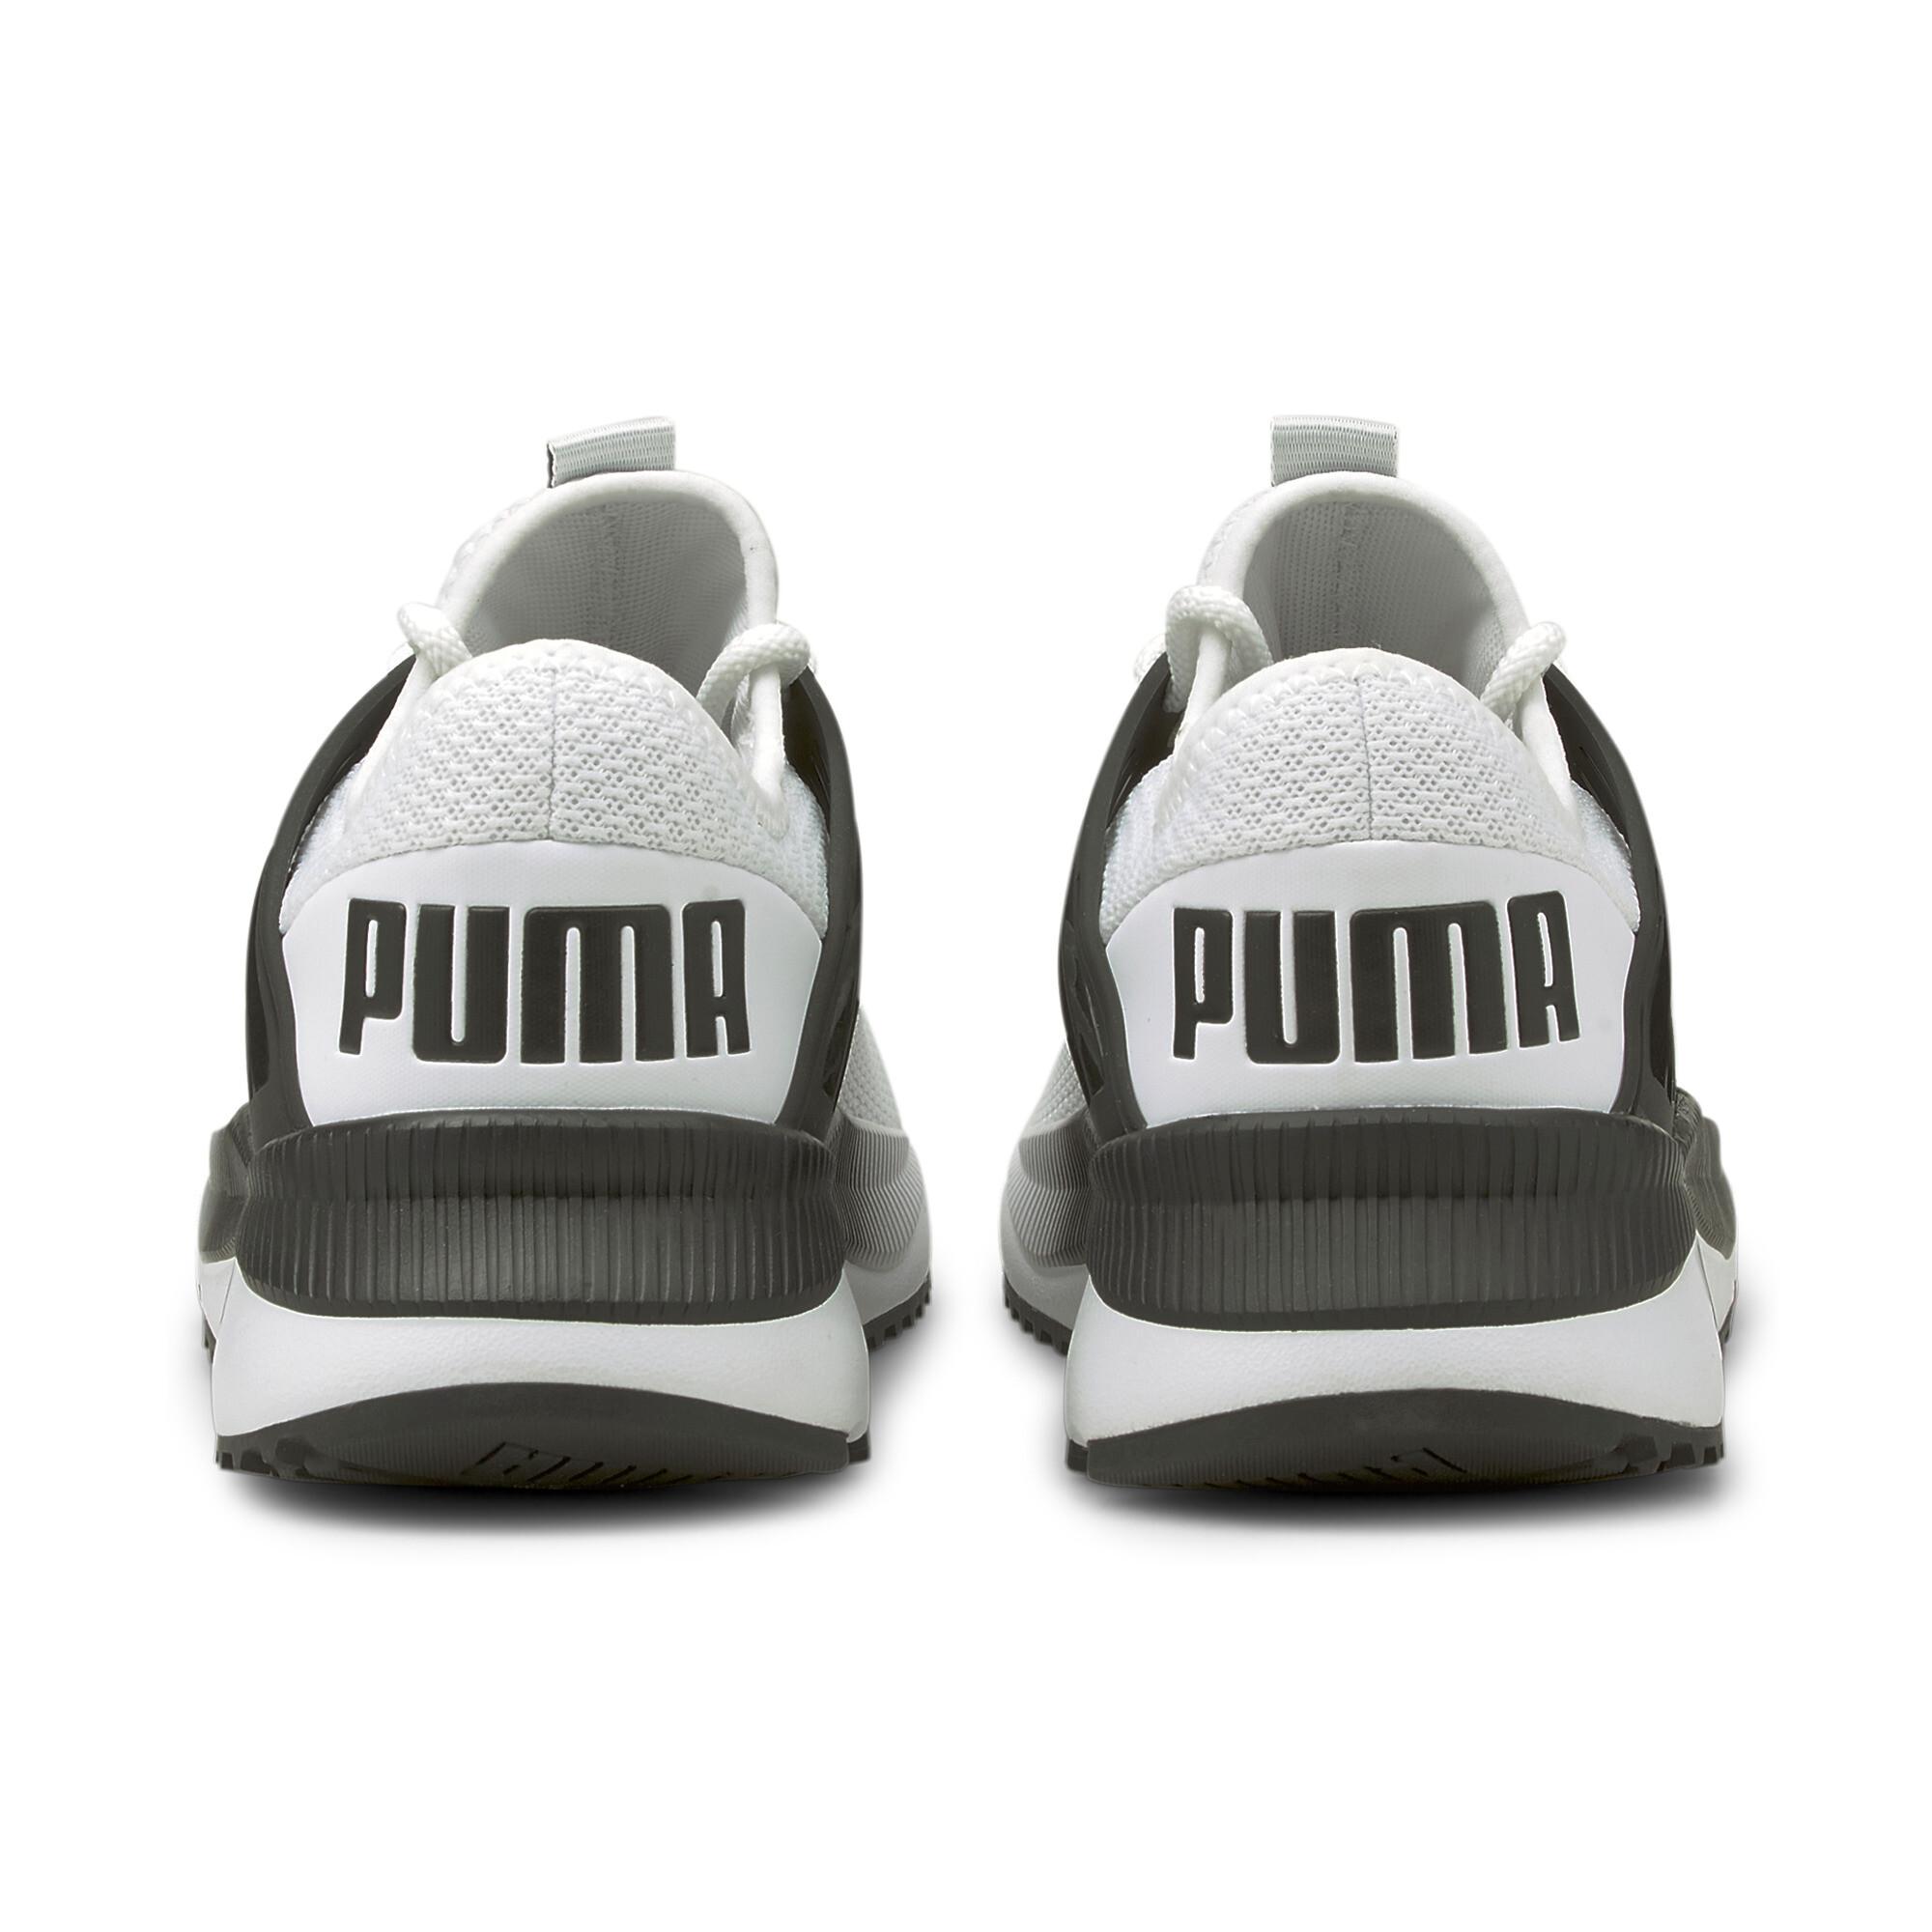 thumbnail 18 - PUMA Men's Pacer Future Classic Sneakers